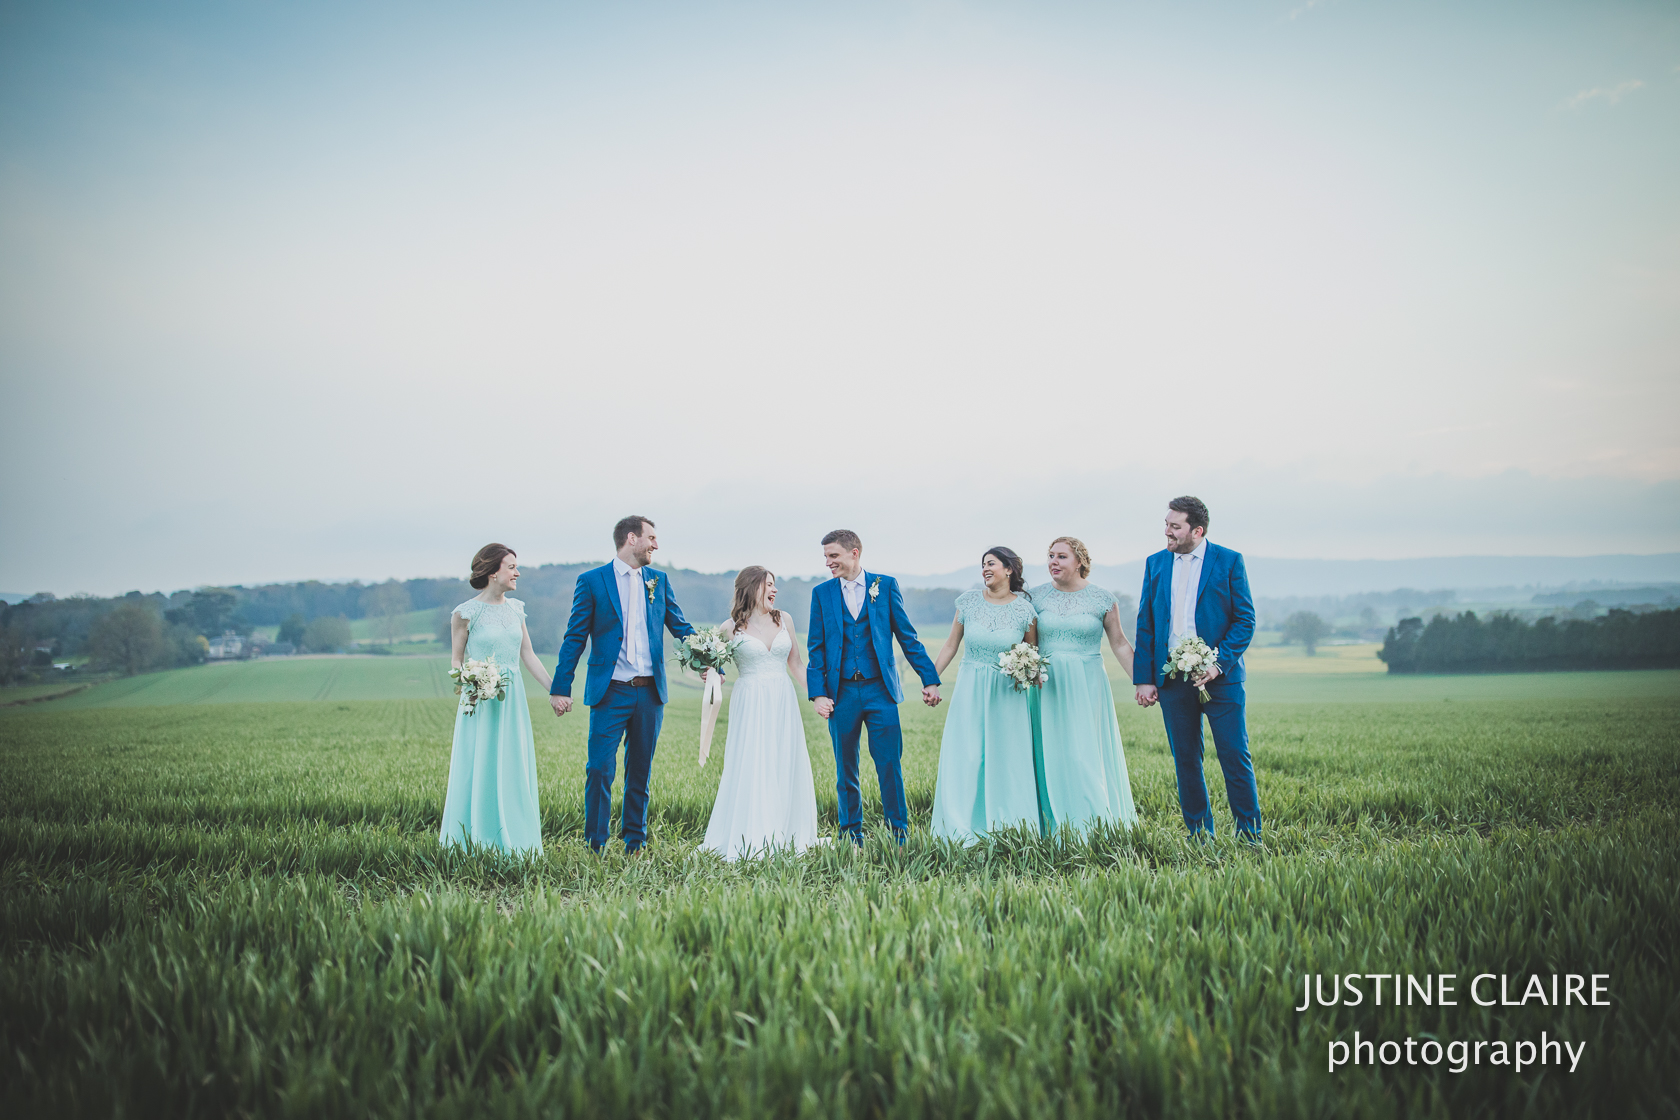 Fitzleroi Fittleworth petworth Billingshurst farm Wedding Photography by Justine Claire photographer Arundel Worthing Brighton-65.jpg